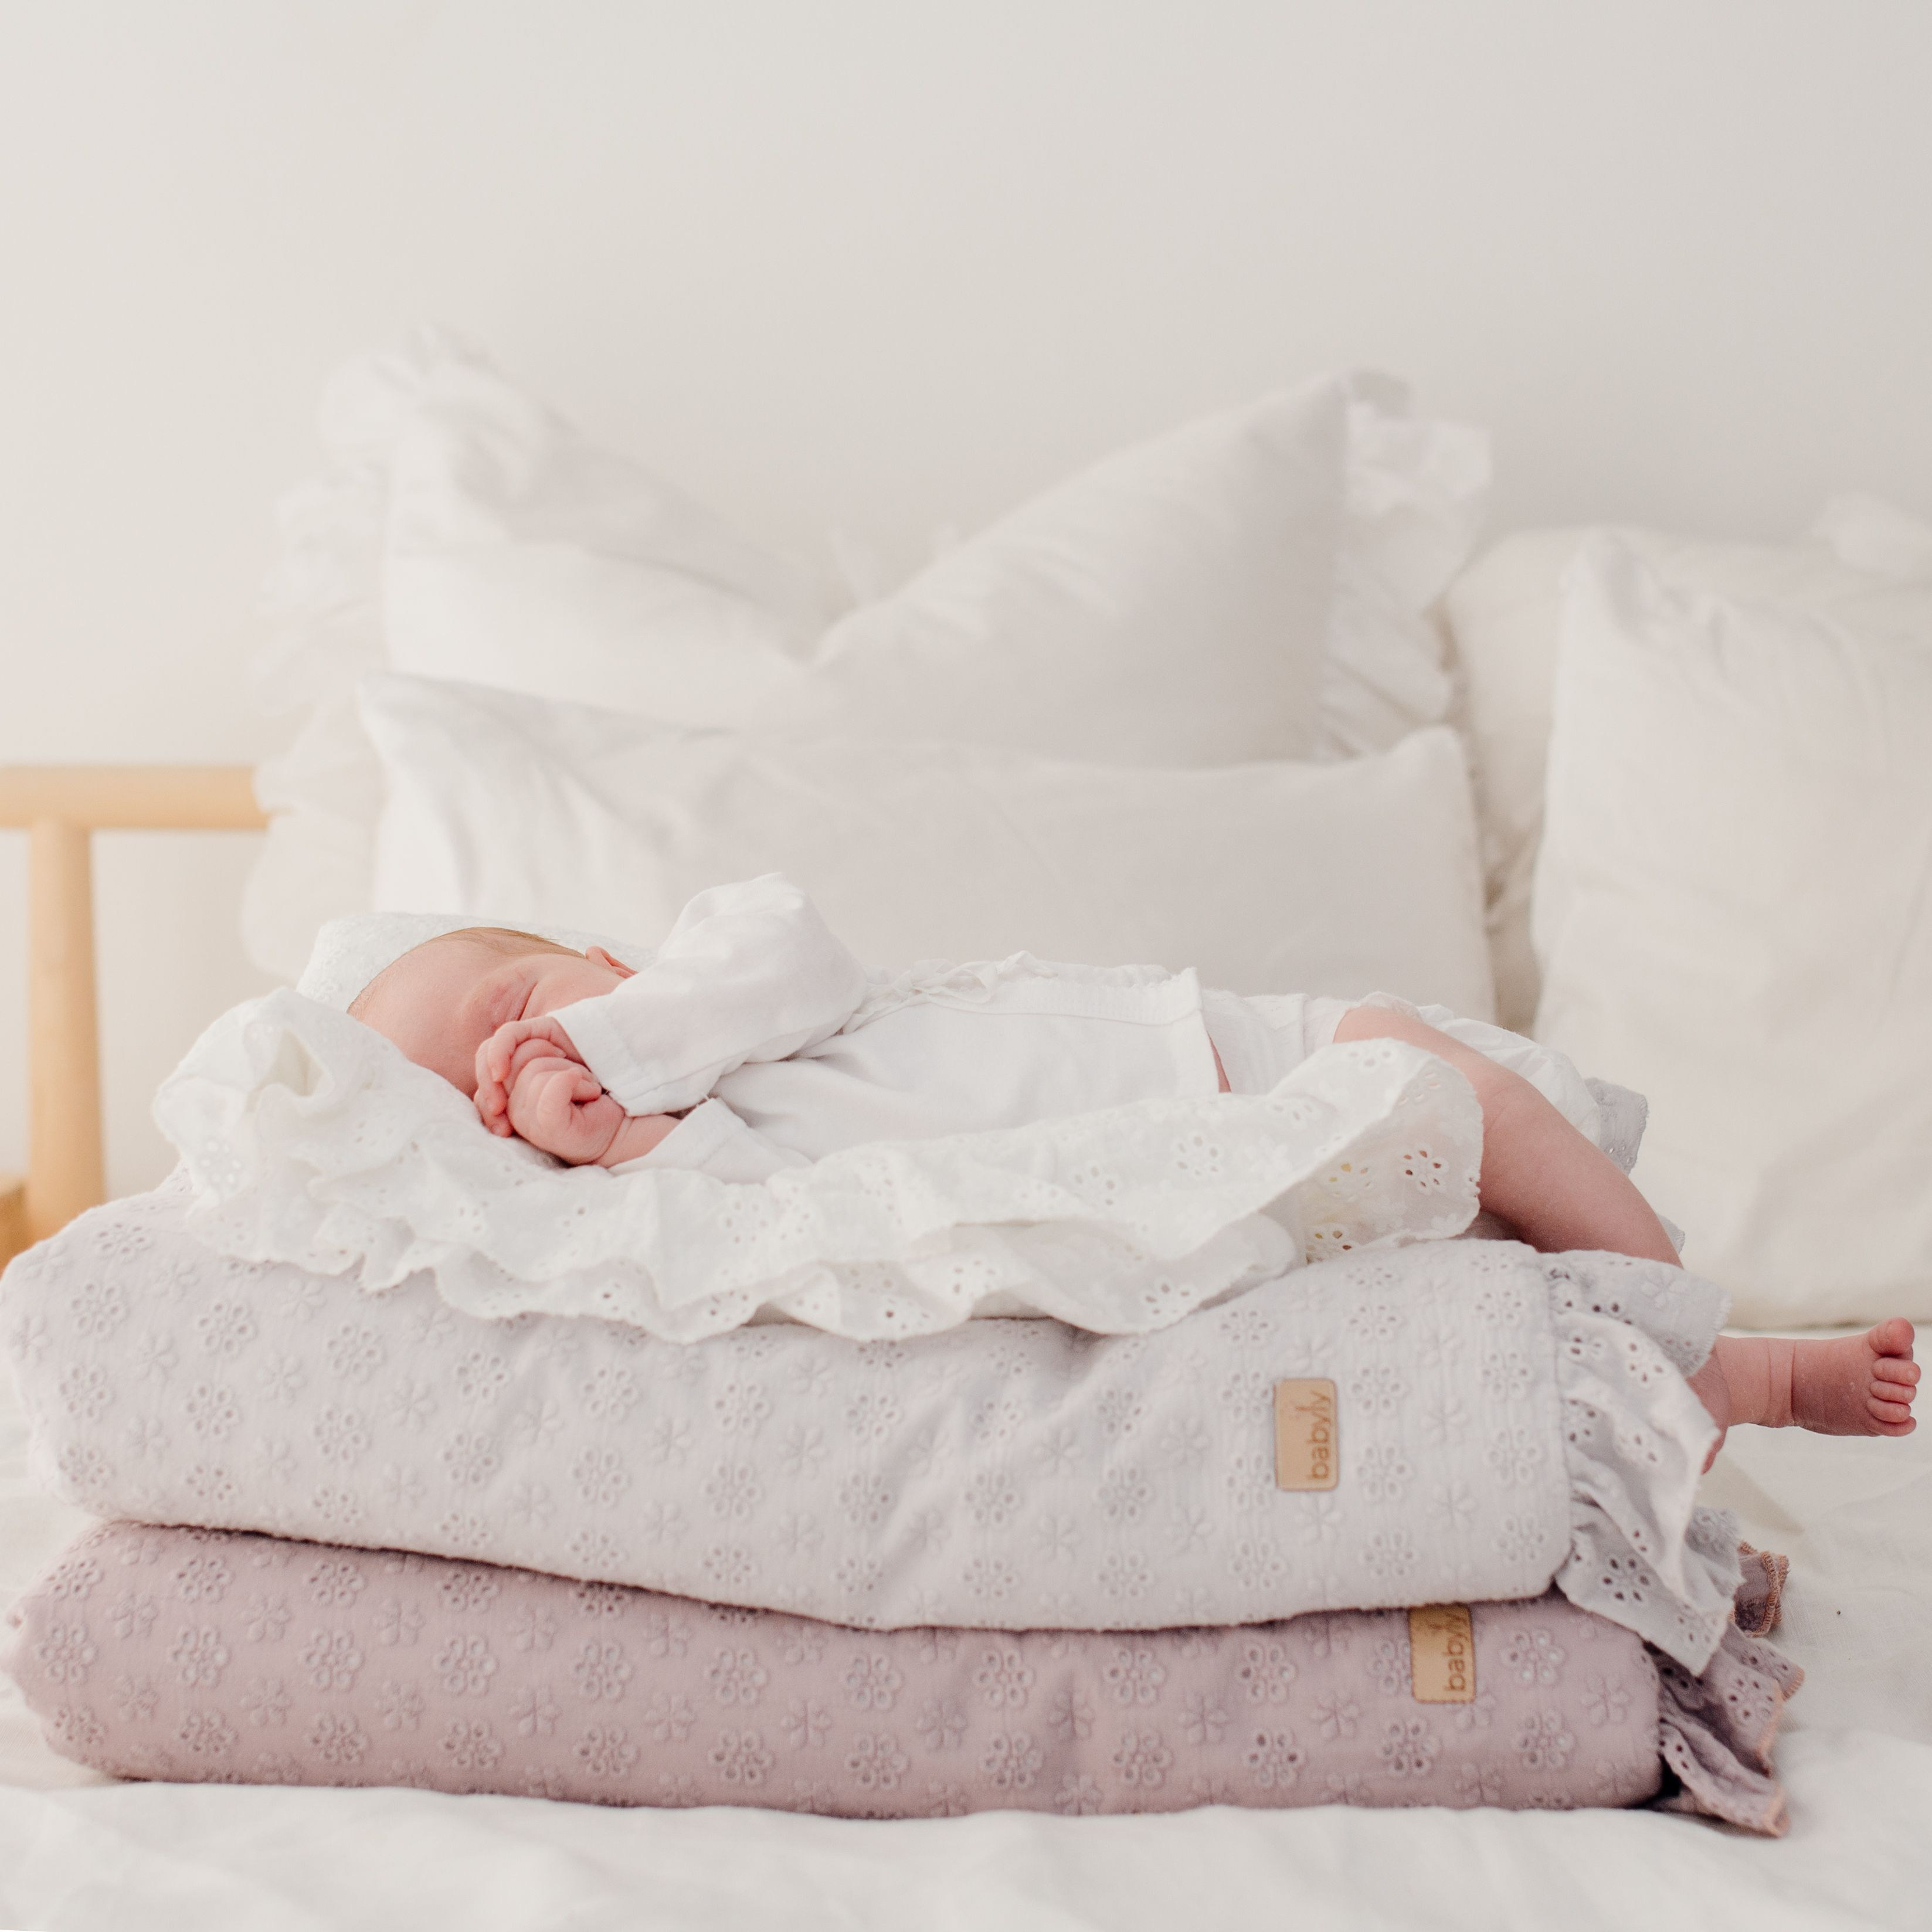 Haftowana Posciel Dla Dziecka Home Decor Bassinet Furniture